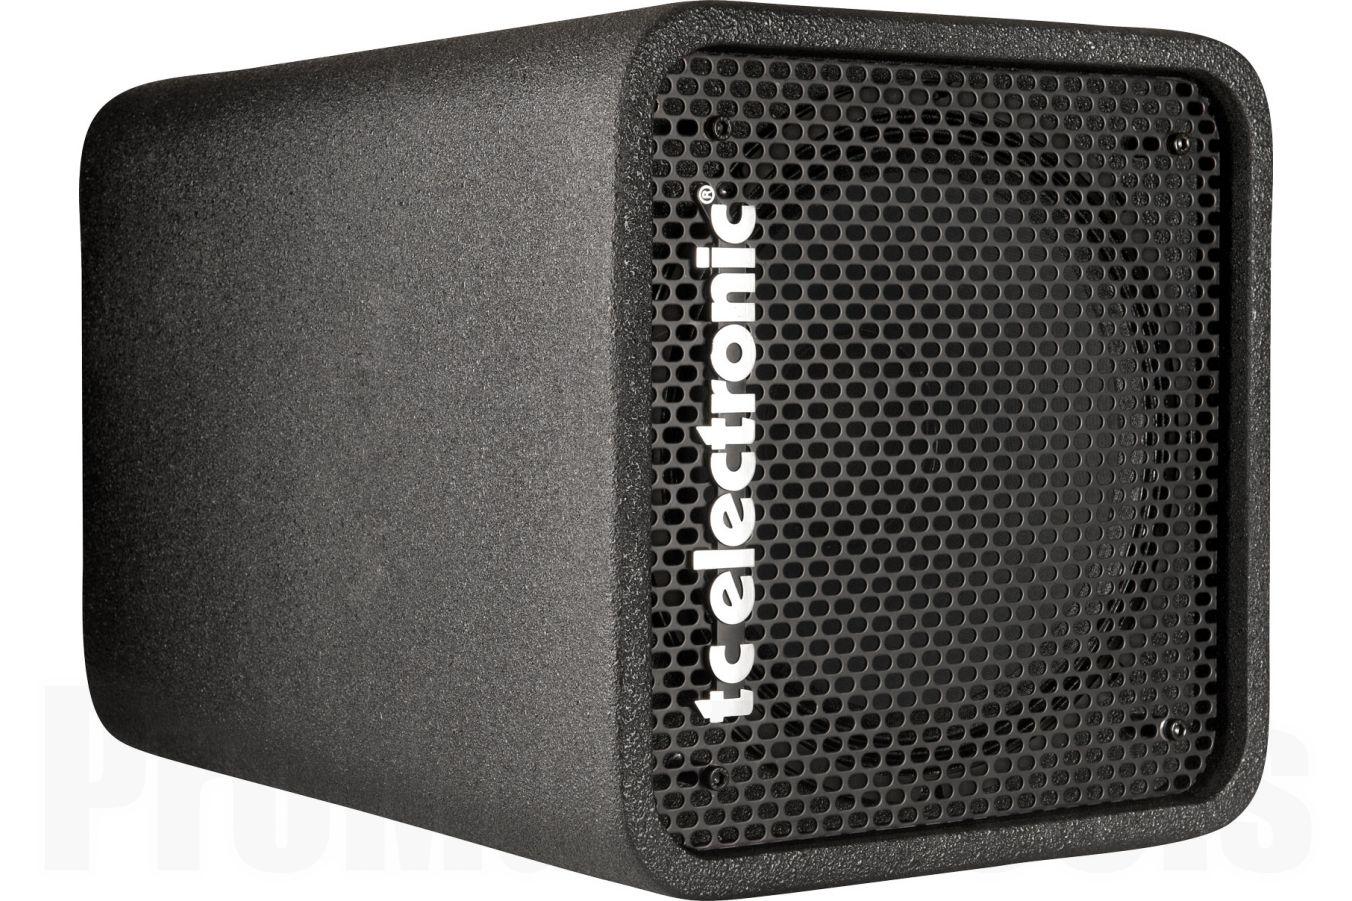 TC Electronic RS112 - b-stock (1x opened box)